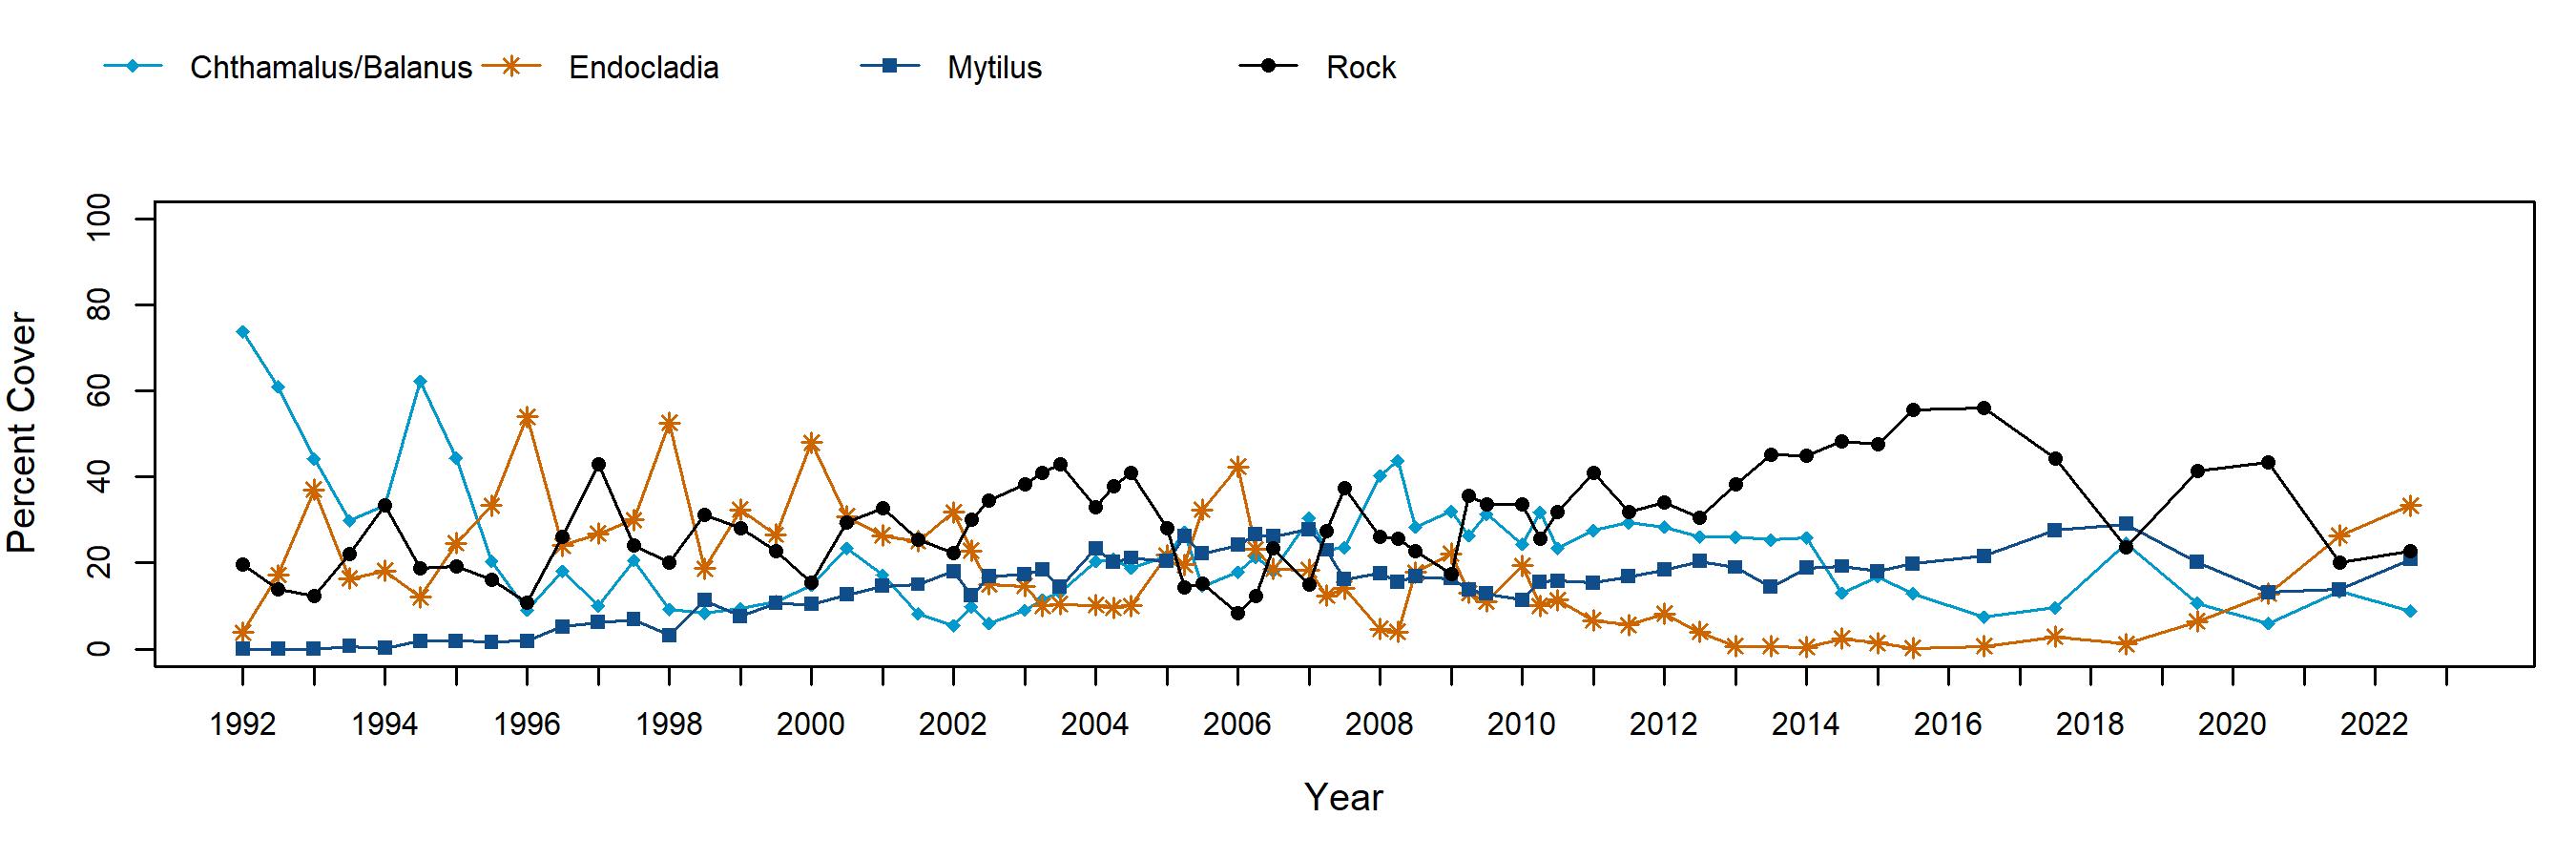 Occulto barnacle trend plot